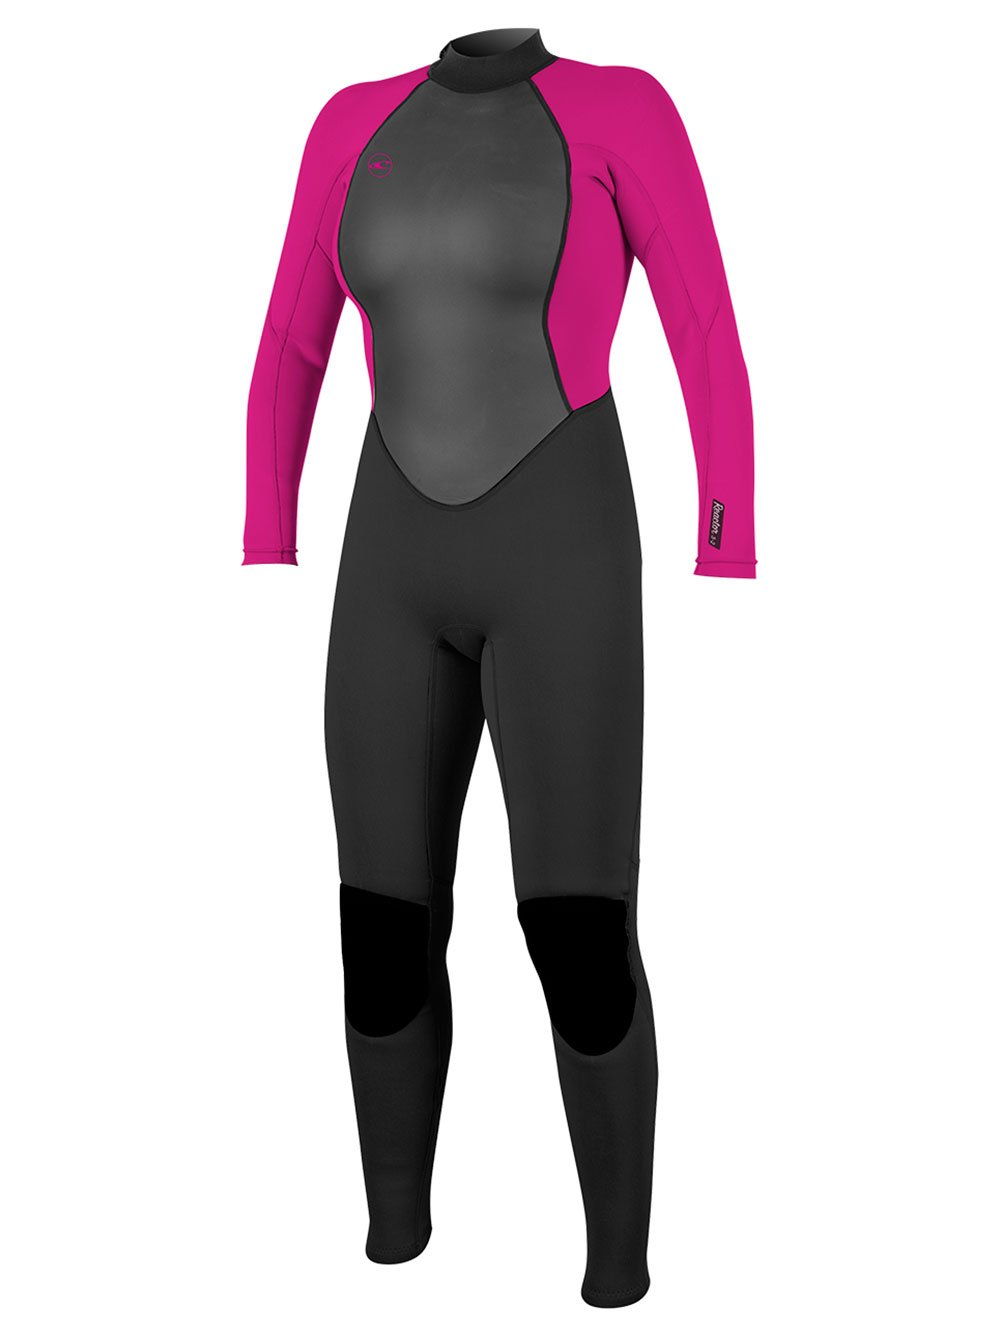 O'Neill Women's Reactor-2 3/2mm Back Zip Full Wetsuit, Black/Berry, 6